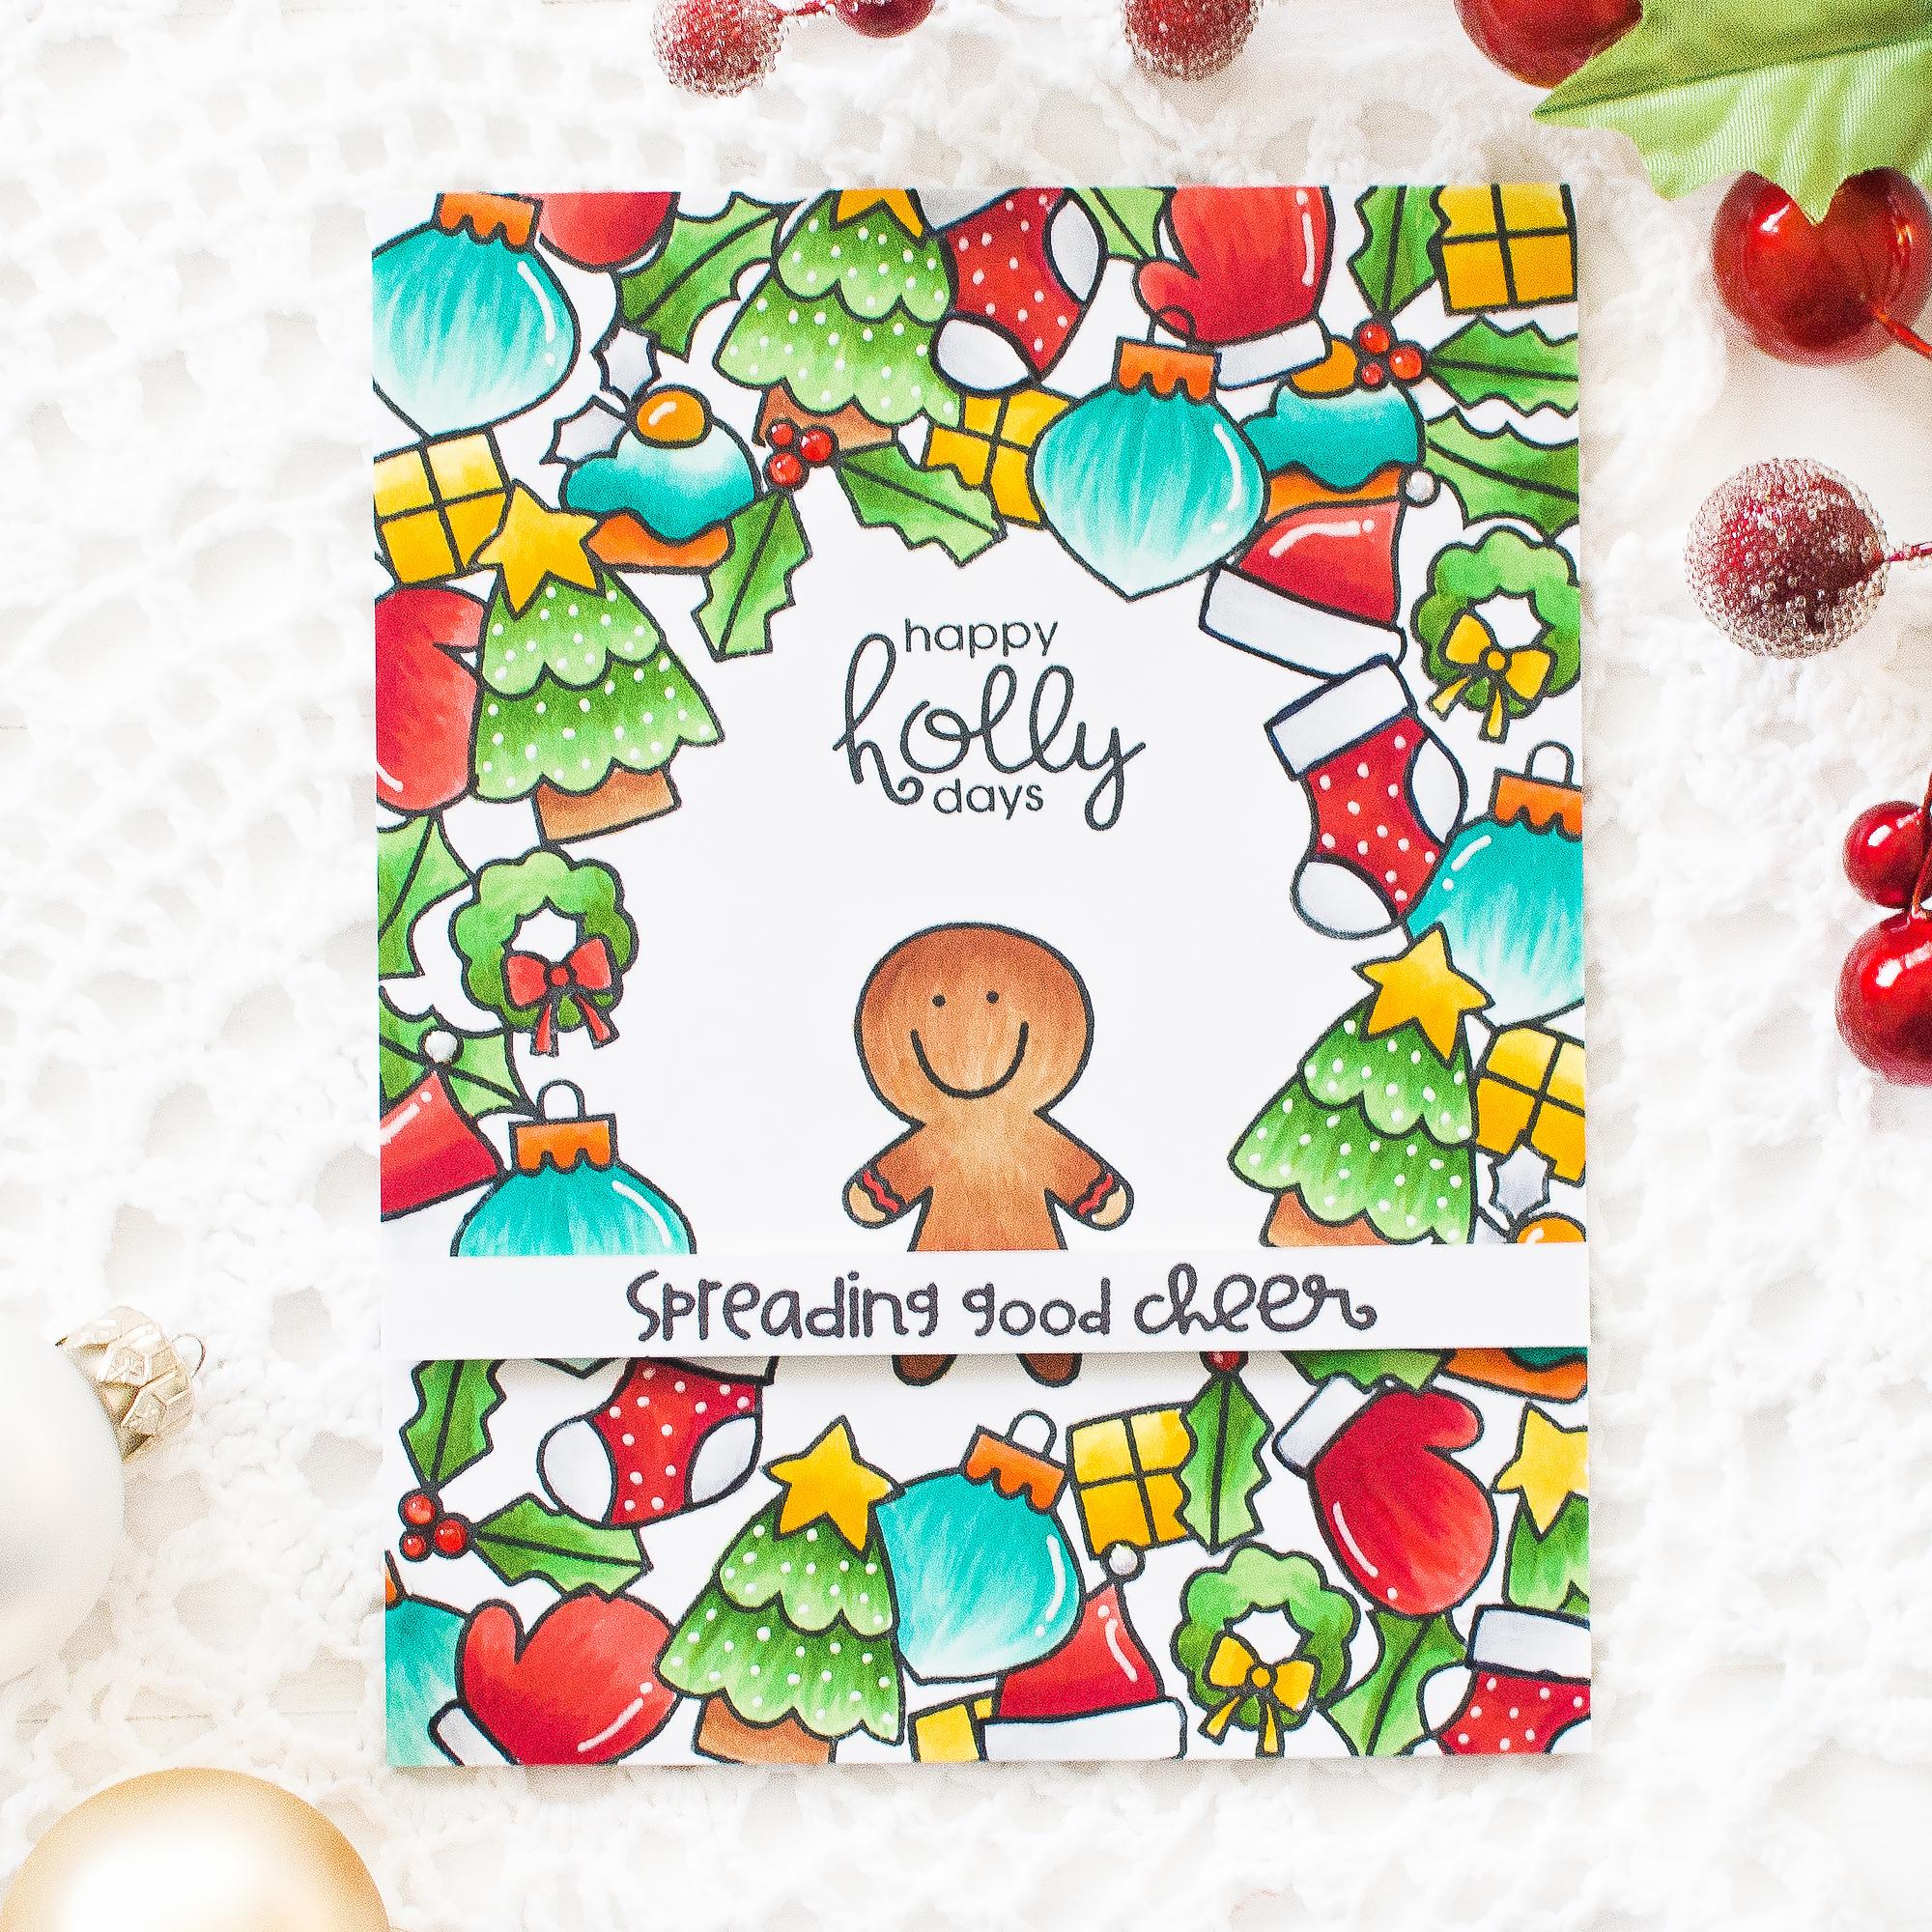 advent-calendar-extravaganza-taheerah-atchia-giveaway